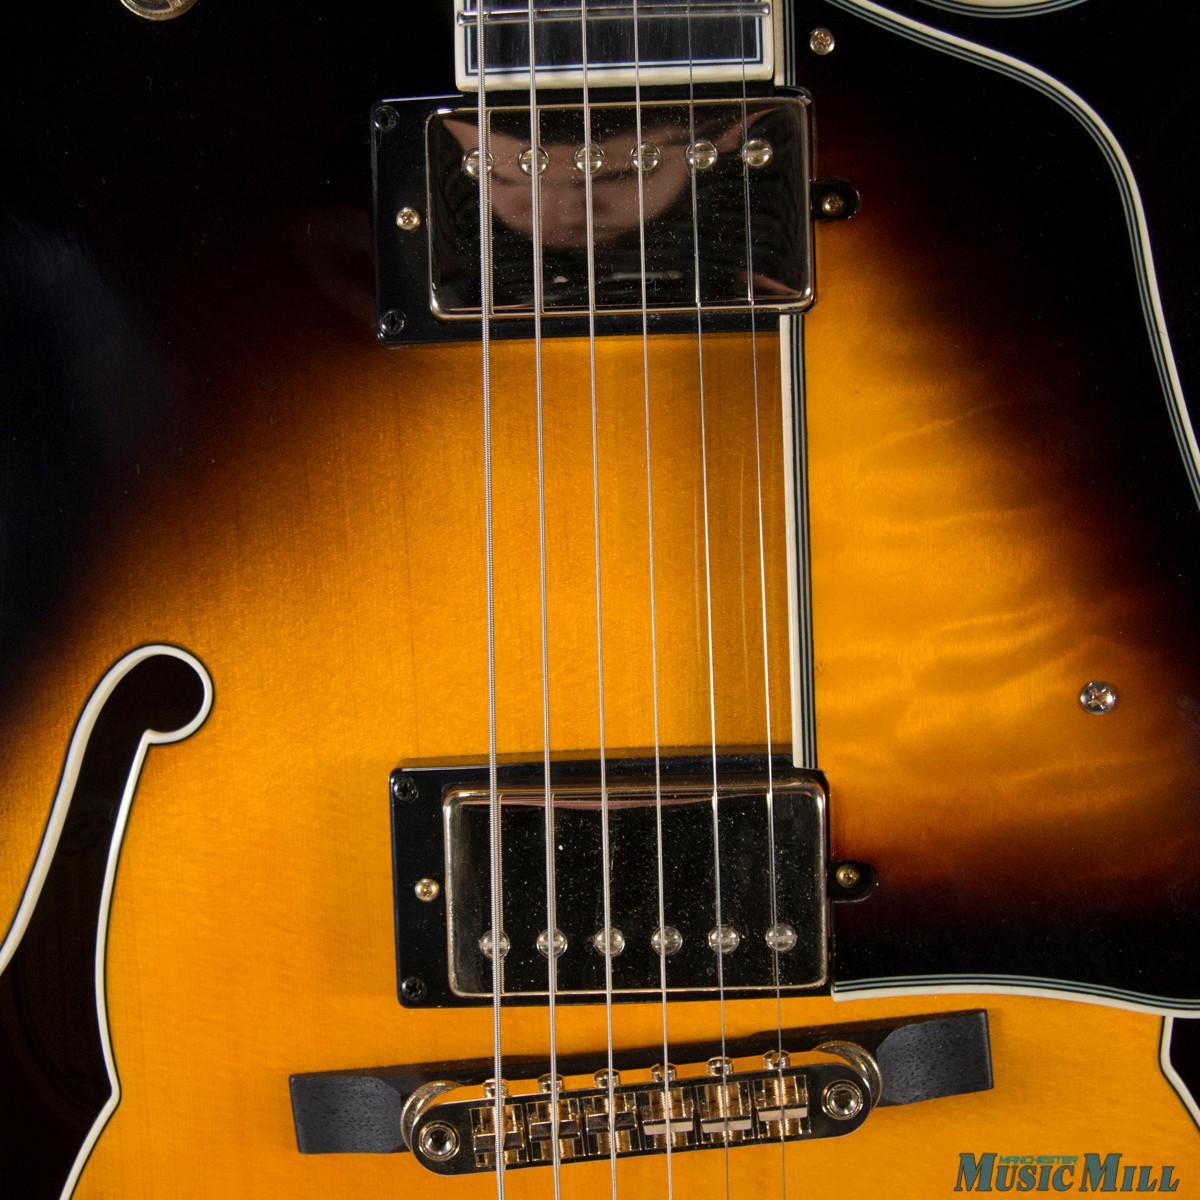 Ibanez LGB30 George Benson Signature Hollow Body Electric Guitar Vintage Yellow Sunburst